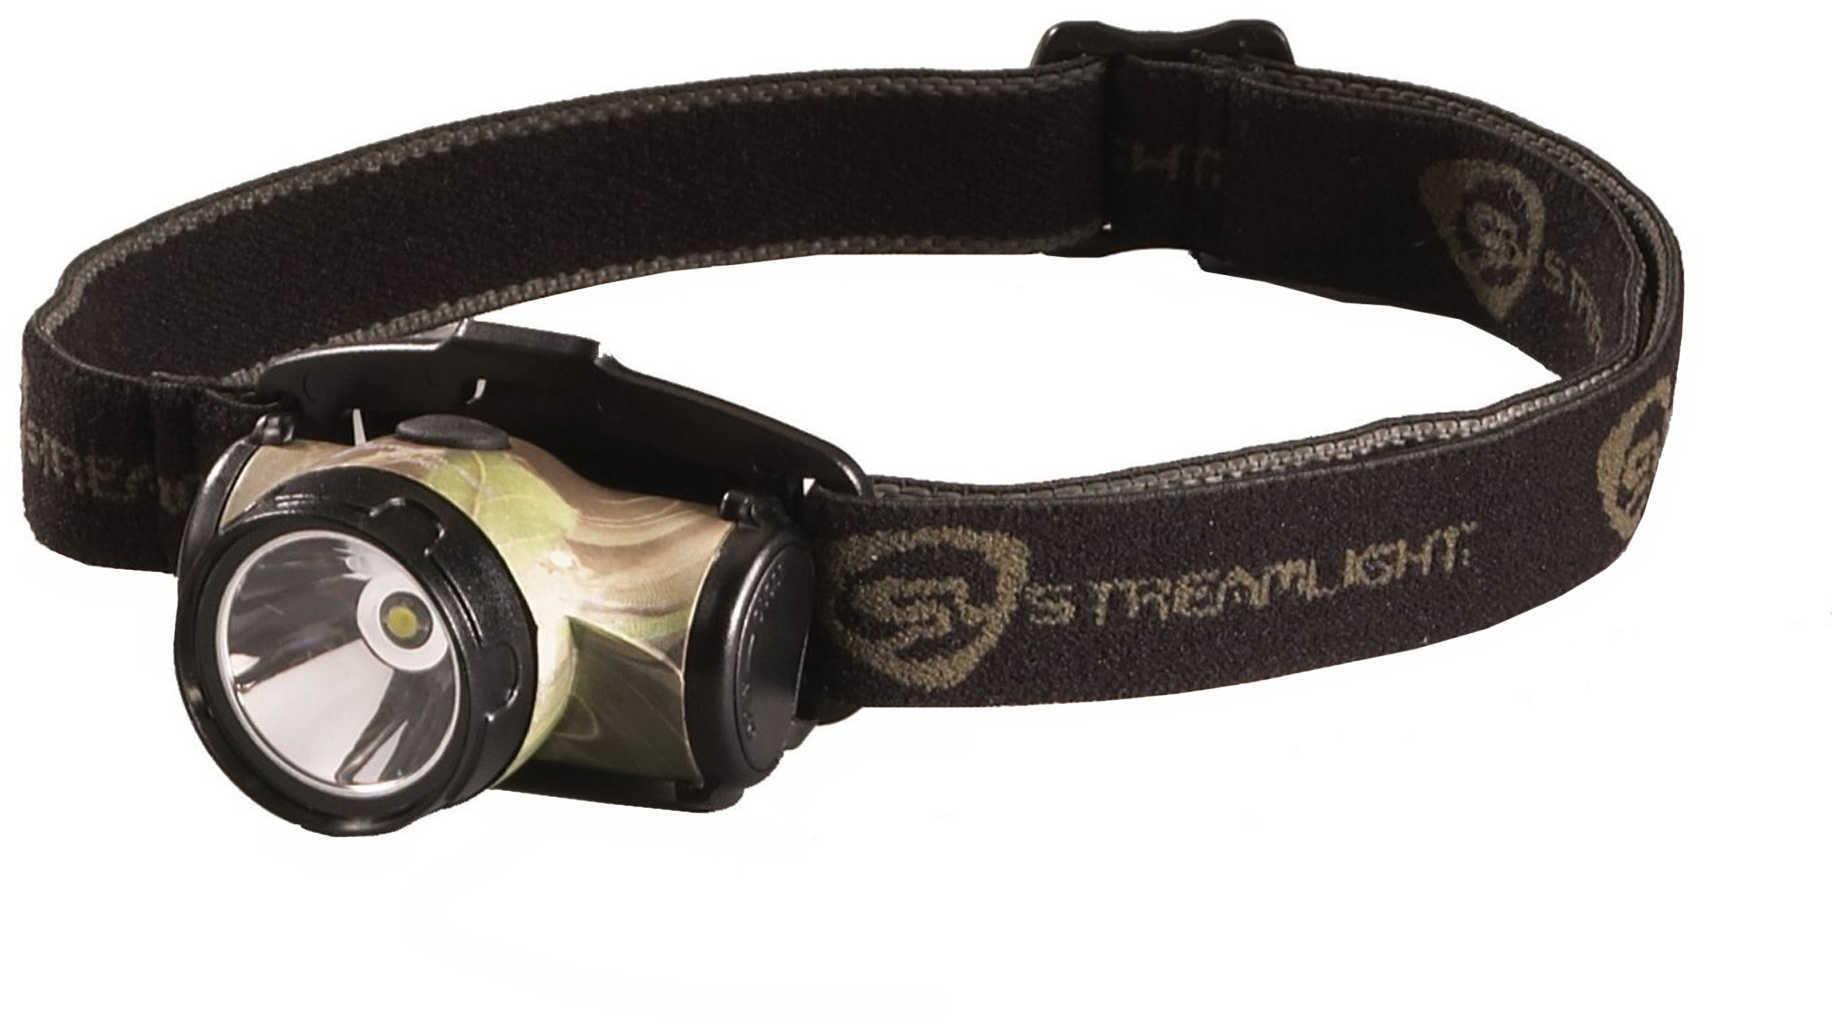 Streamlight Enduro Headlamp, Camo Md: 61405